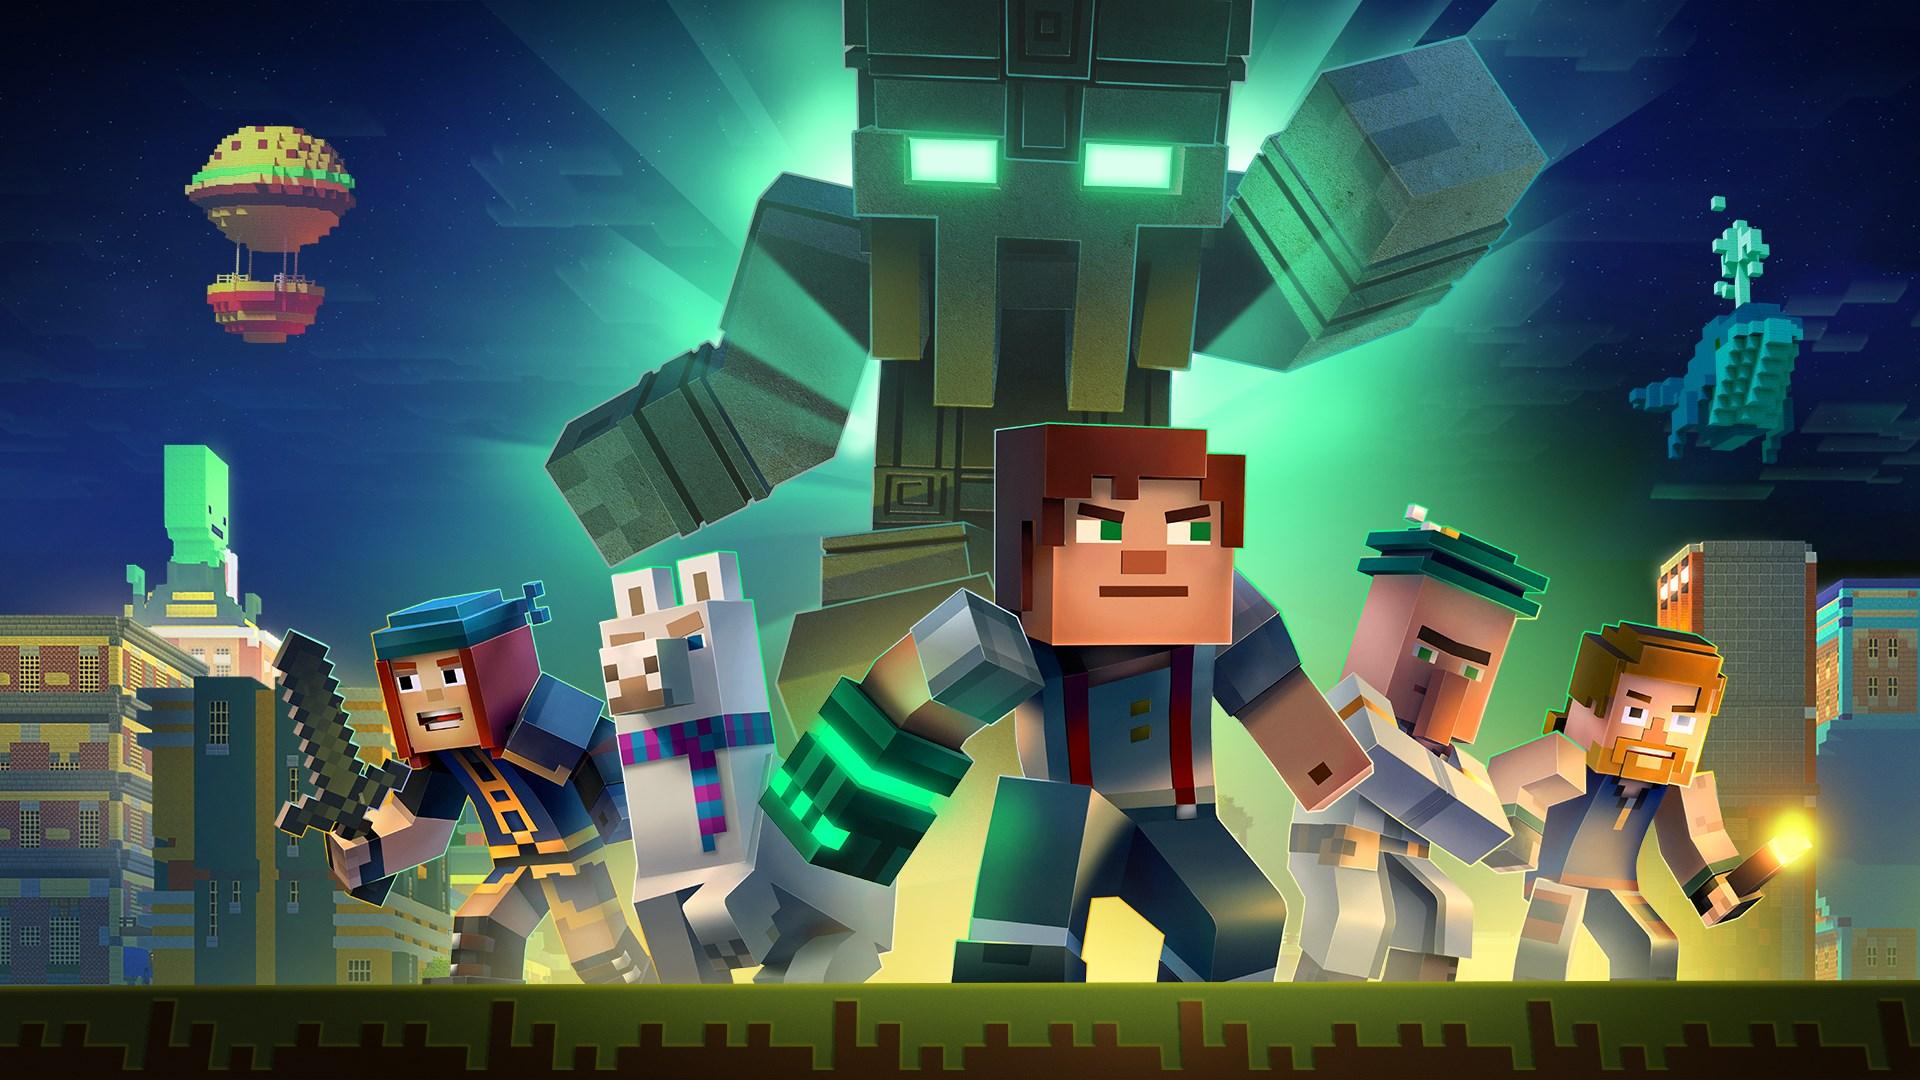 「Minecraft Story mode」の画像検索結果